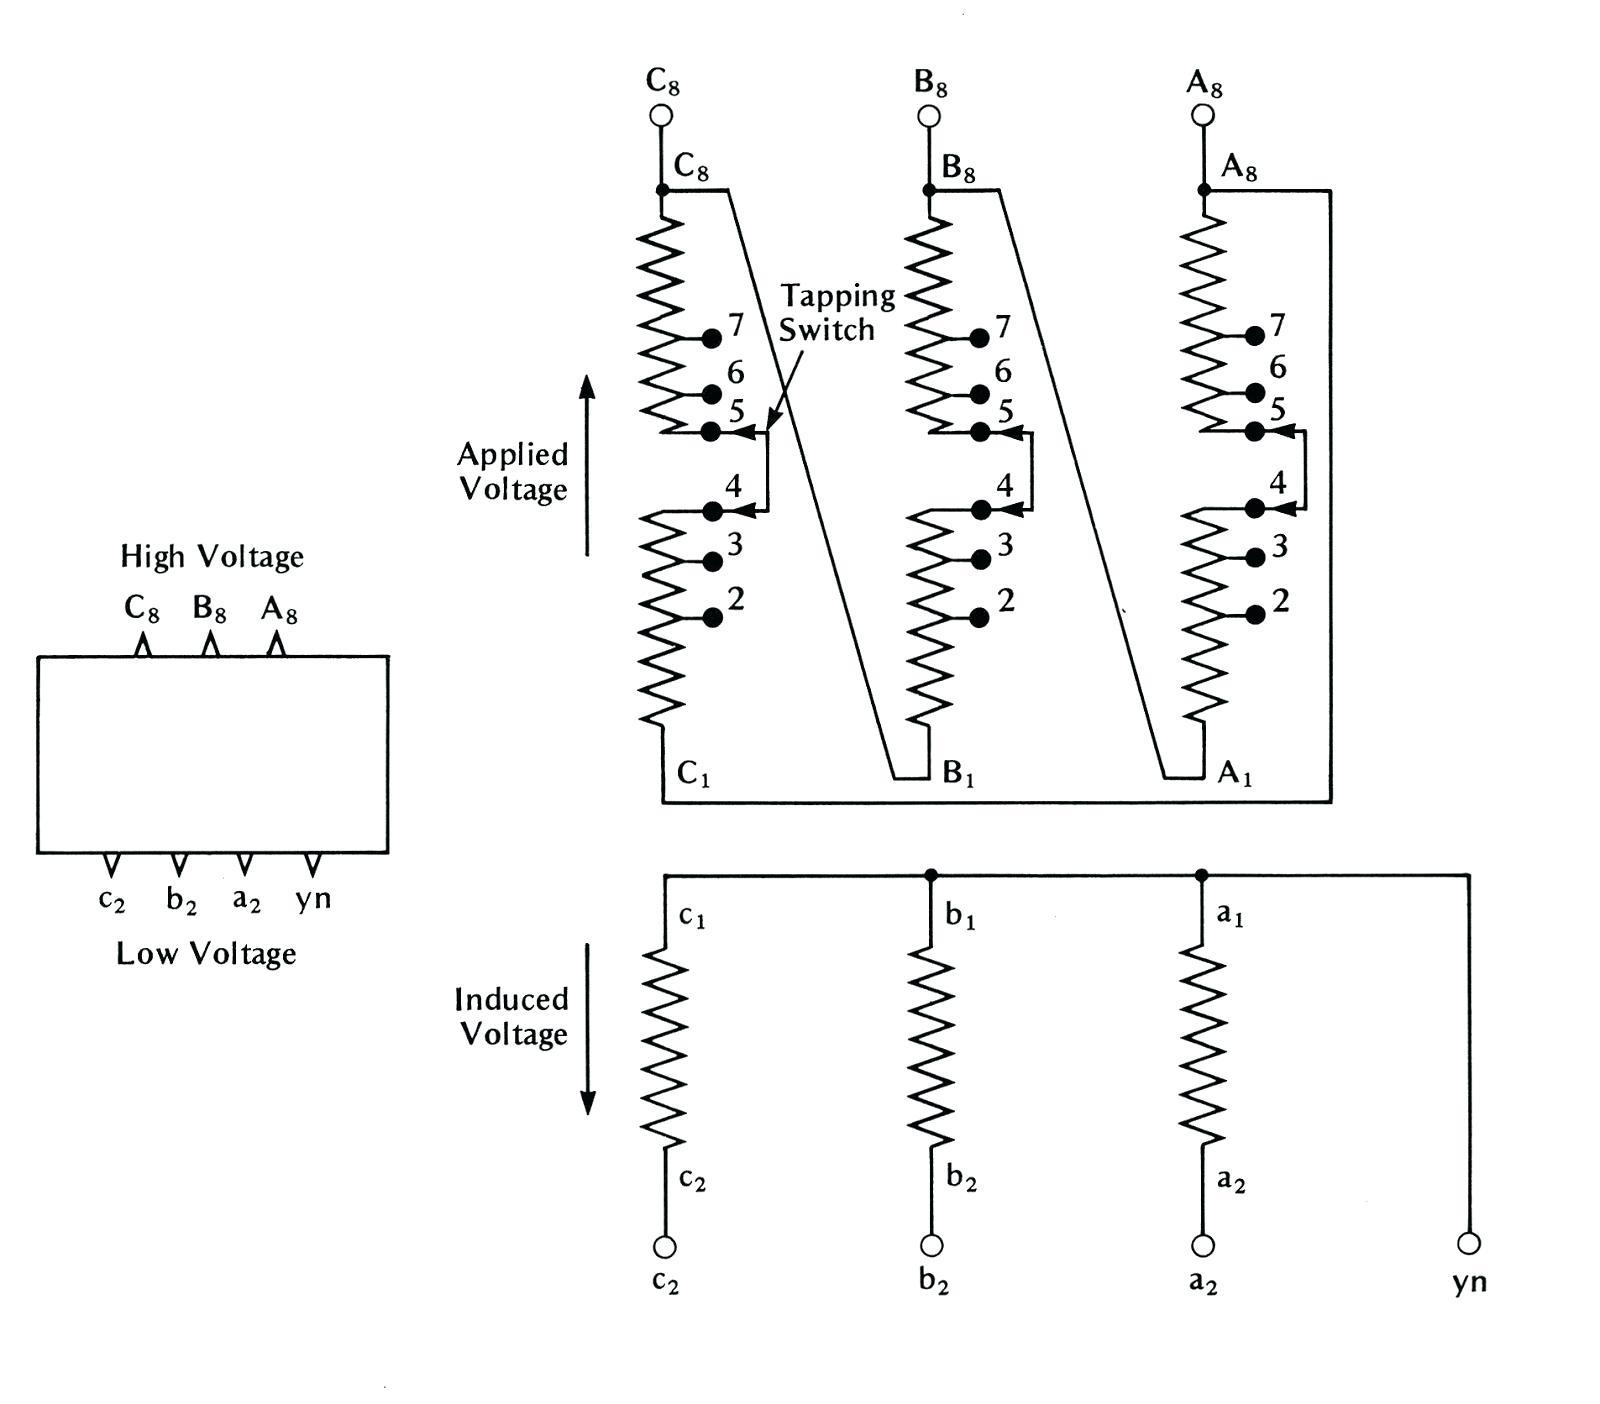 3 Phase Delta Transformer Wiring Diagram Free Download - Schema - 3 Phase Transformer Wiring Diagram